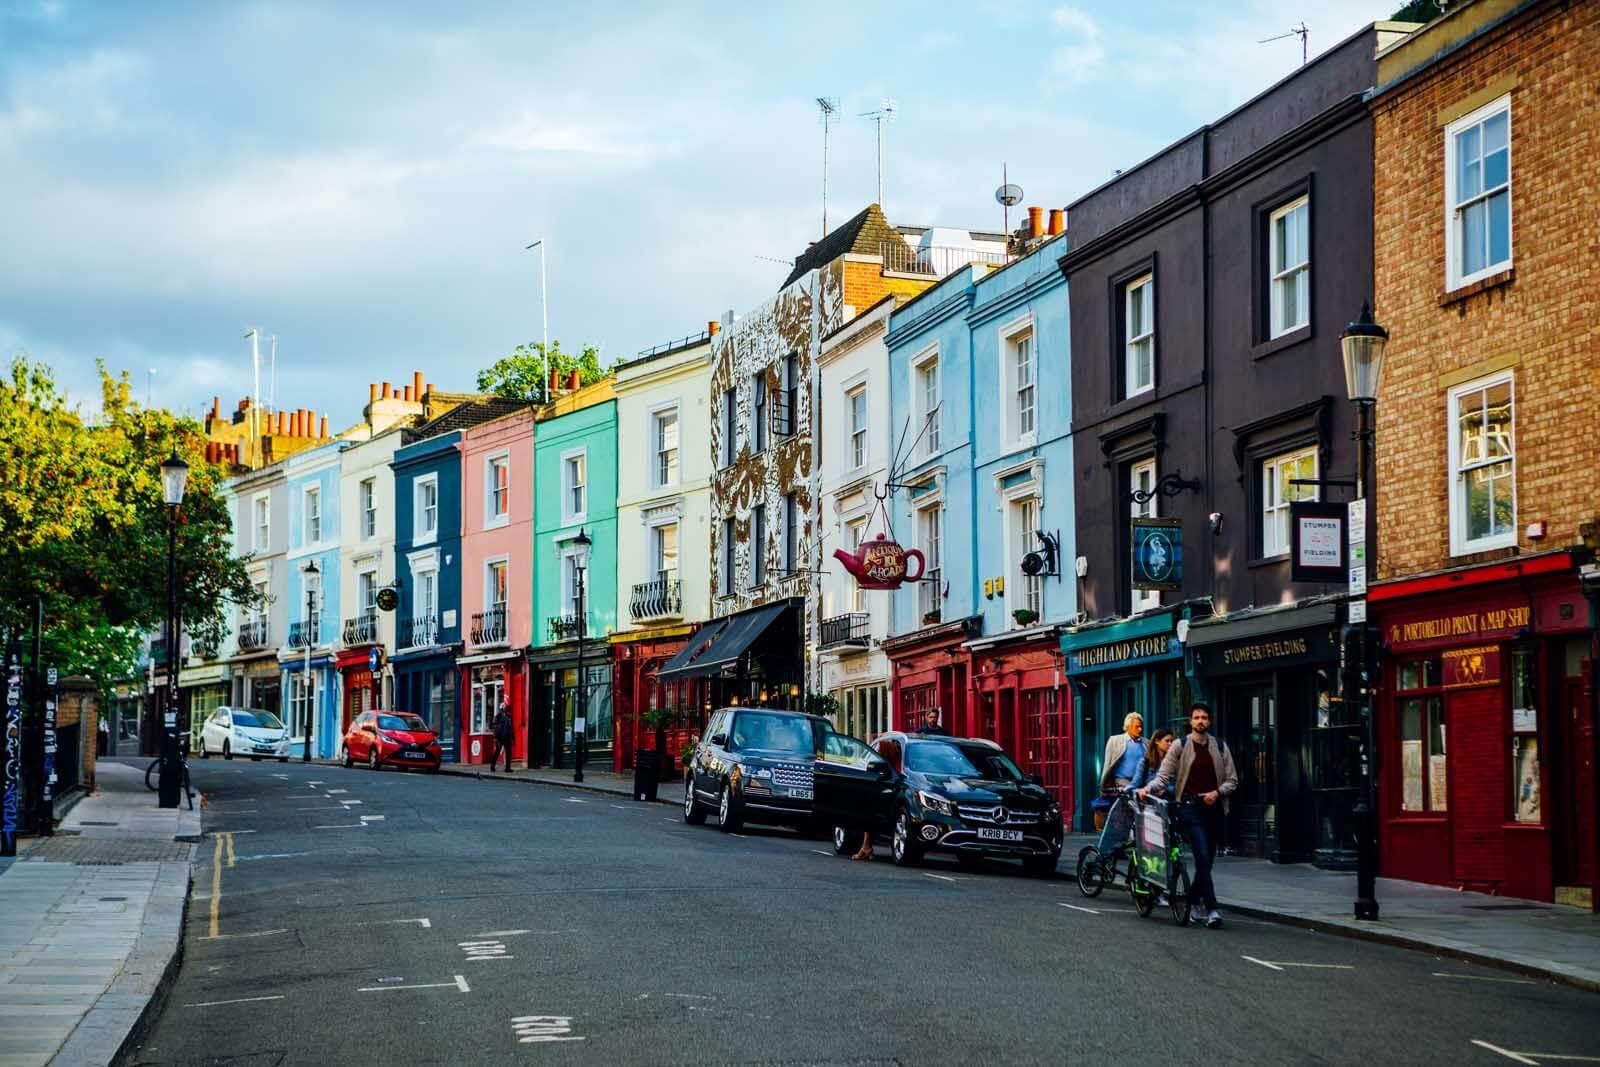 Colorful buildings on Portobello Road in London